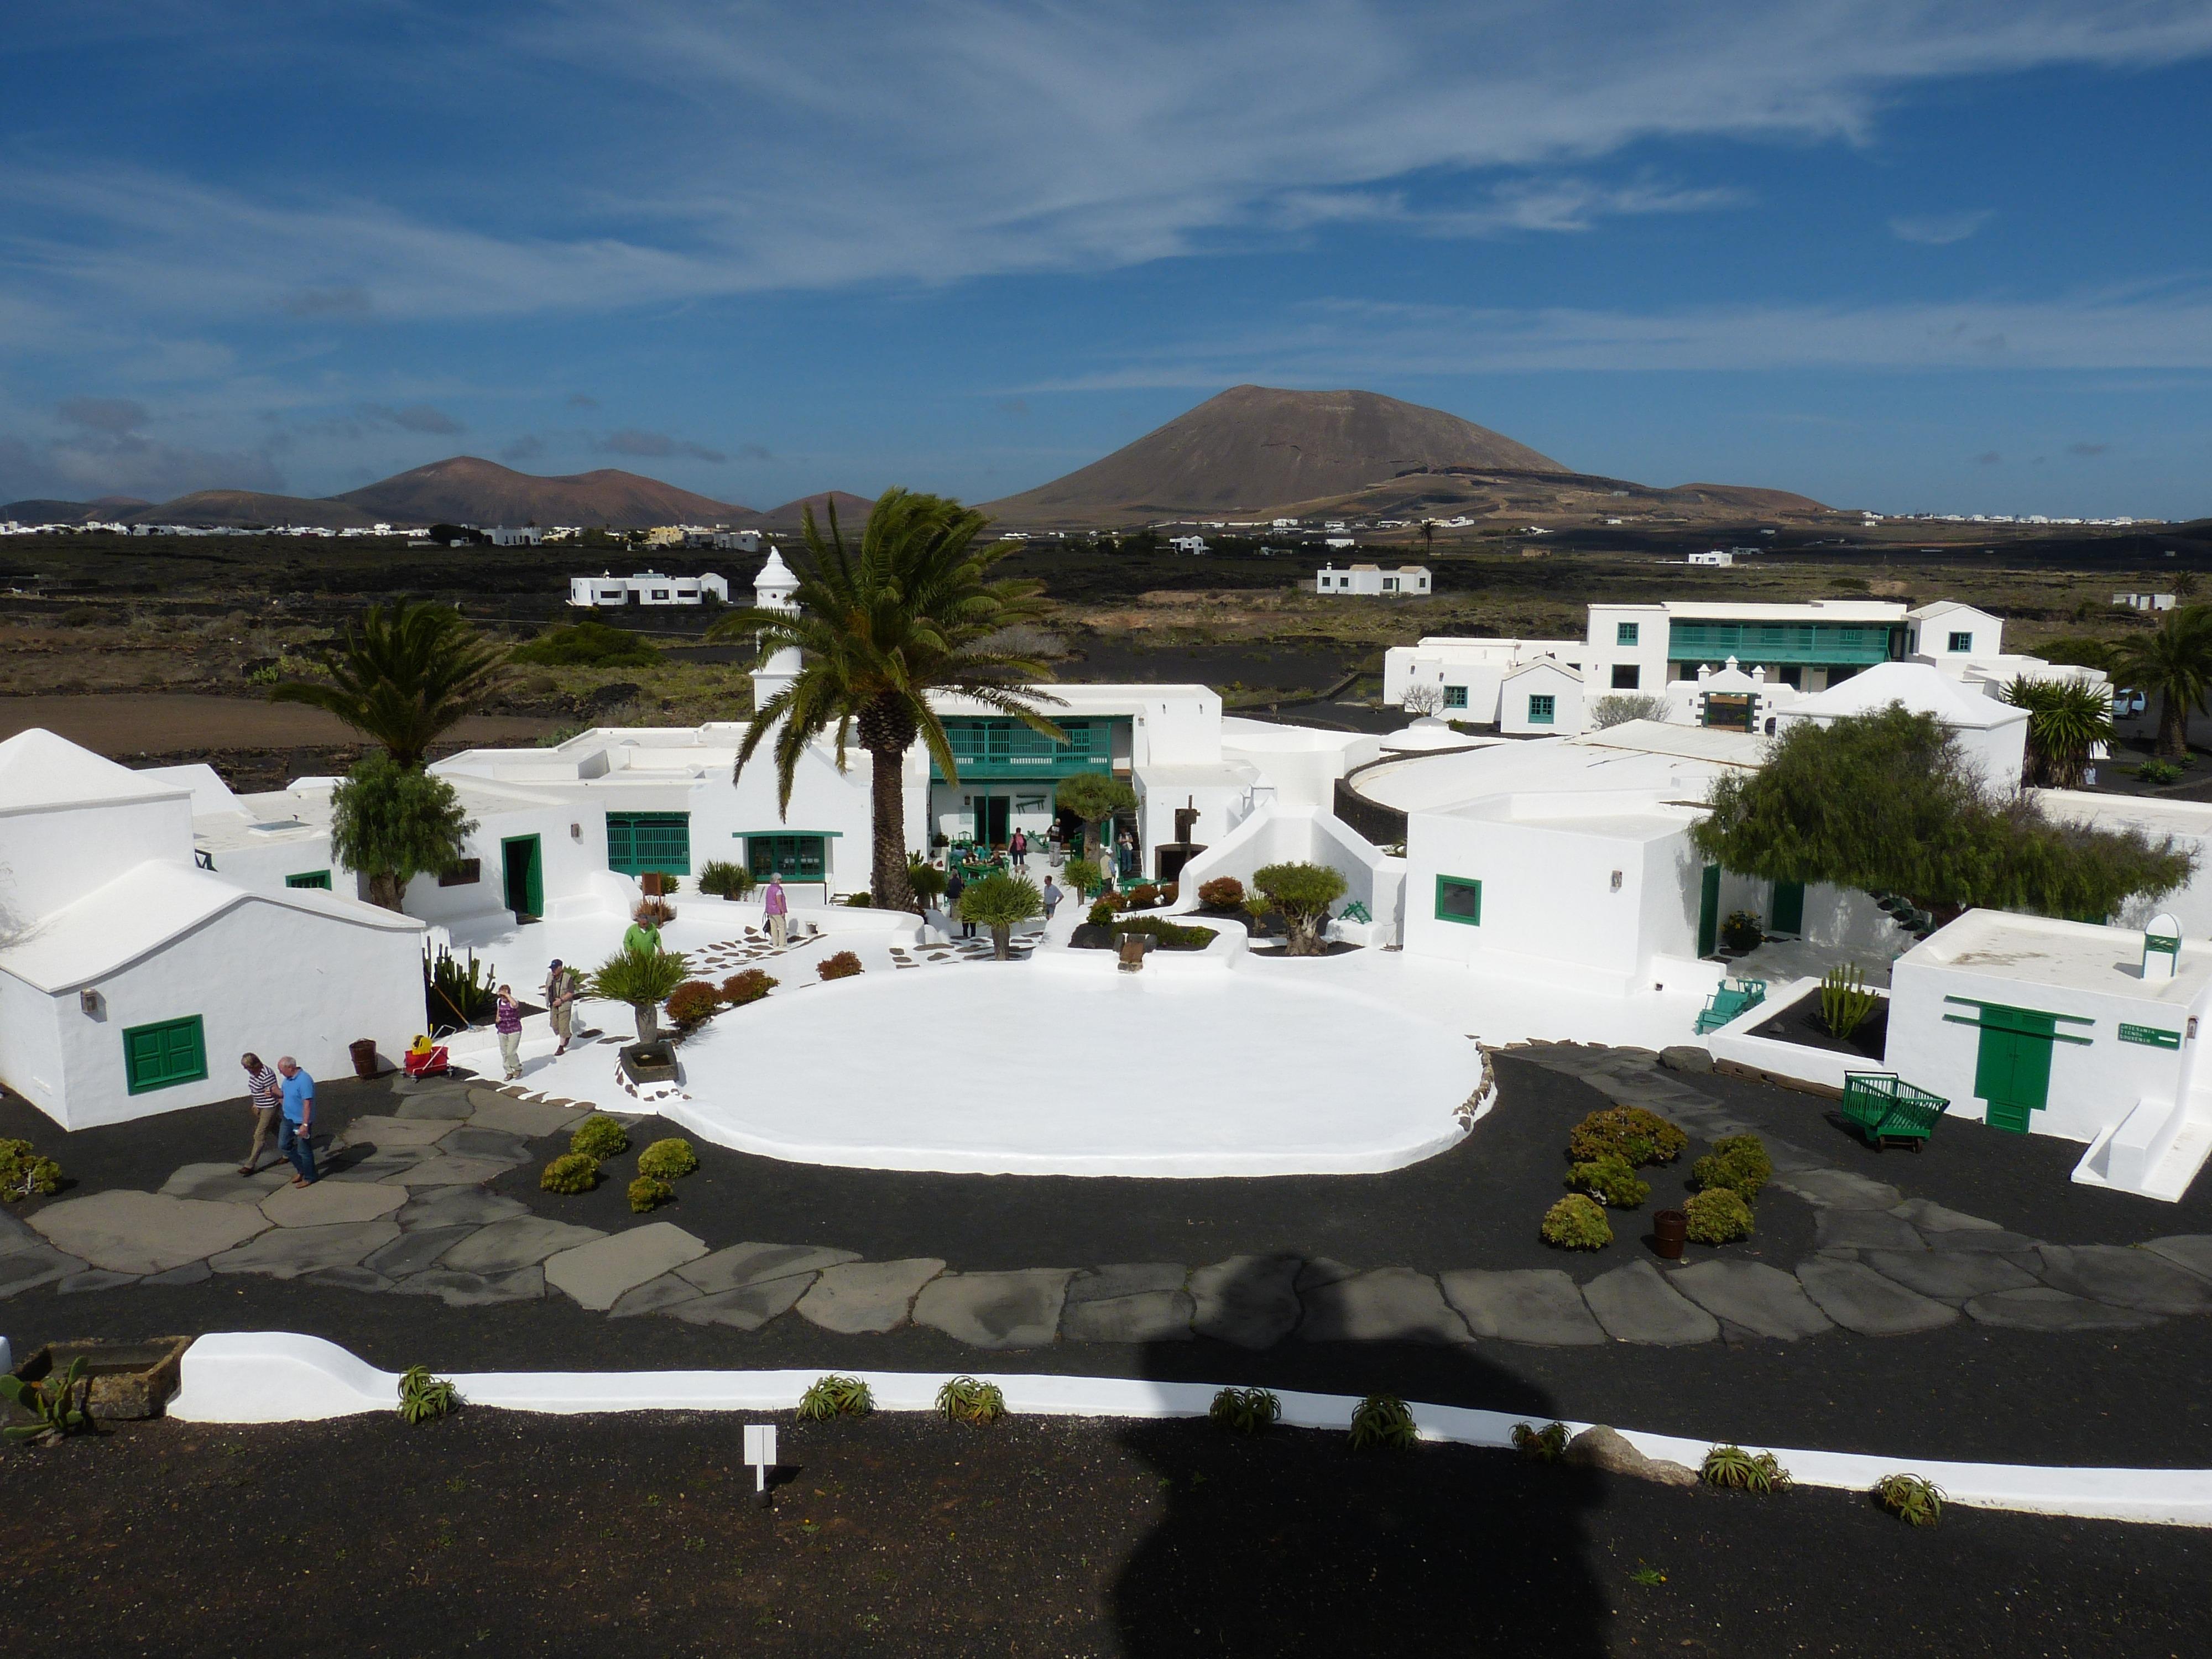 Fotos gratis paisaje naturaleza monta a blanco casa seco piscina palma volc n turismo - Las casas canarias lanzarote ...